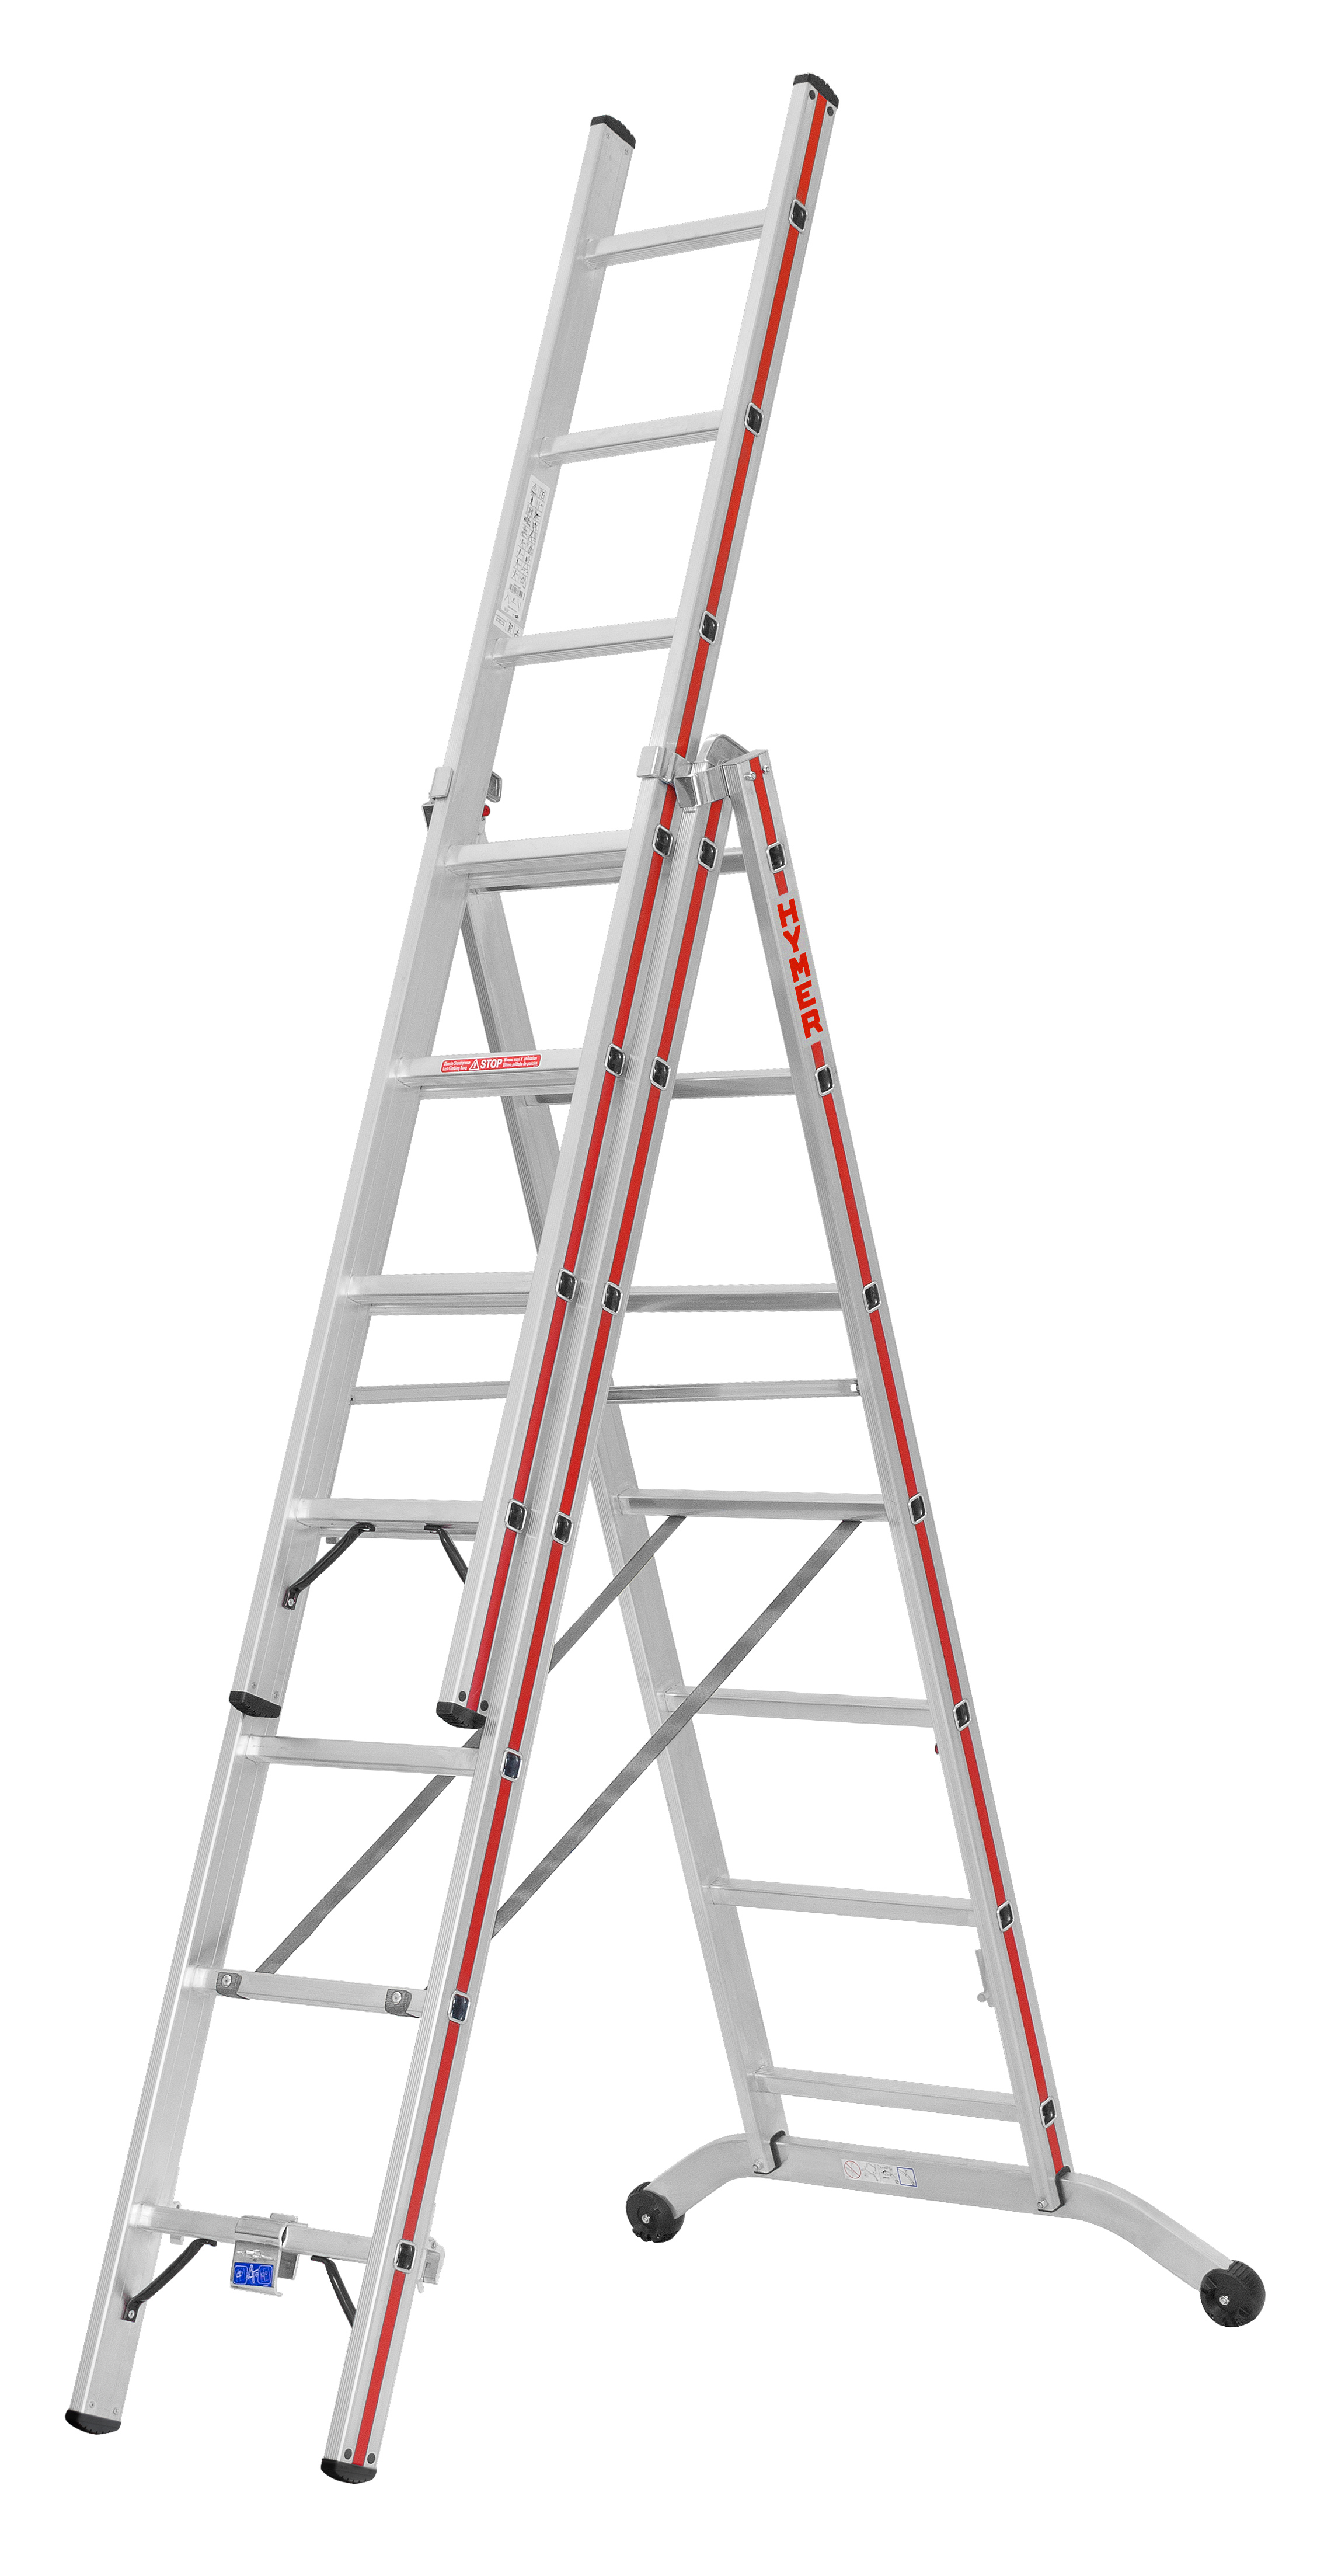 Hymer 6047 combination ladder